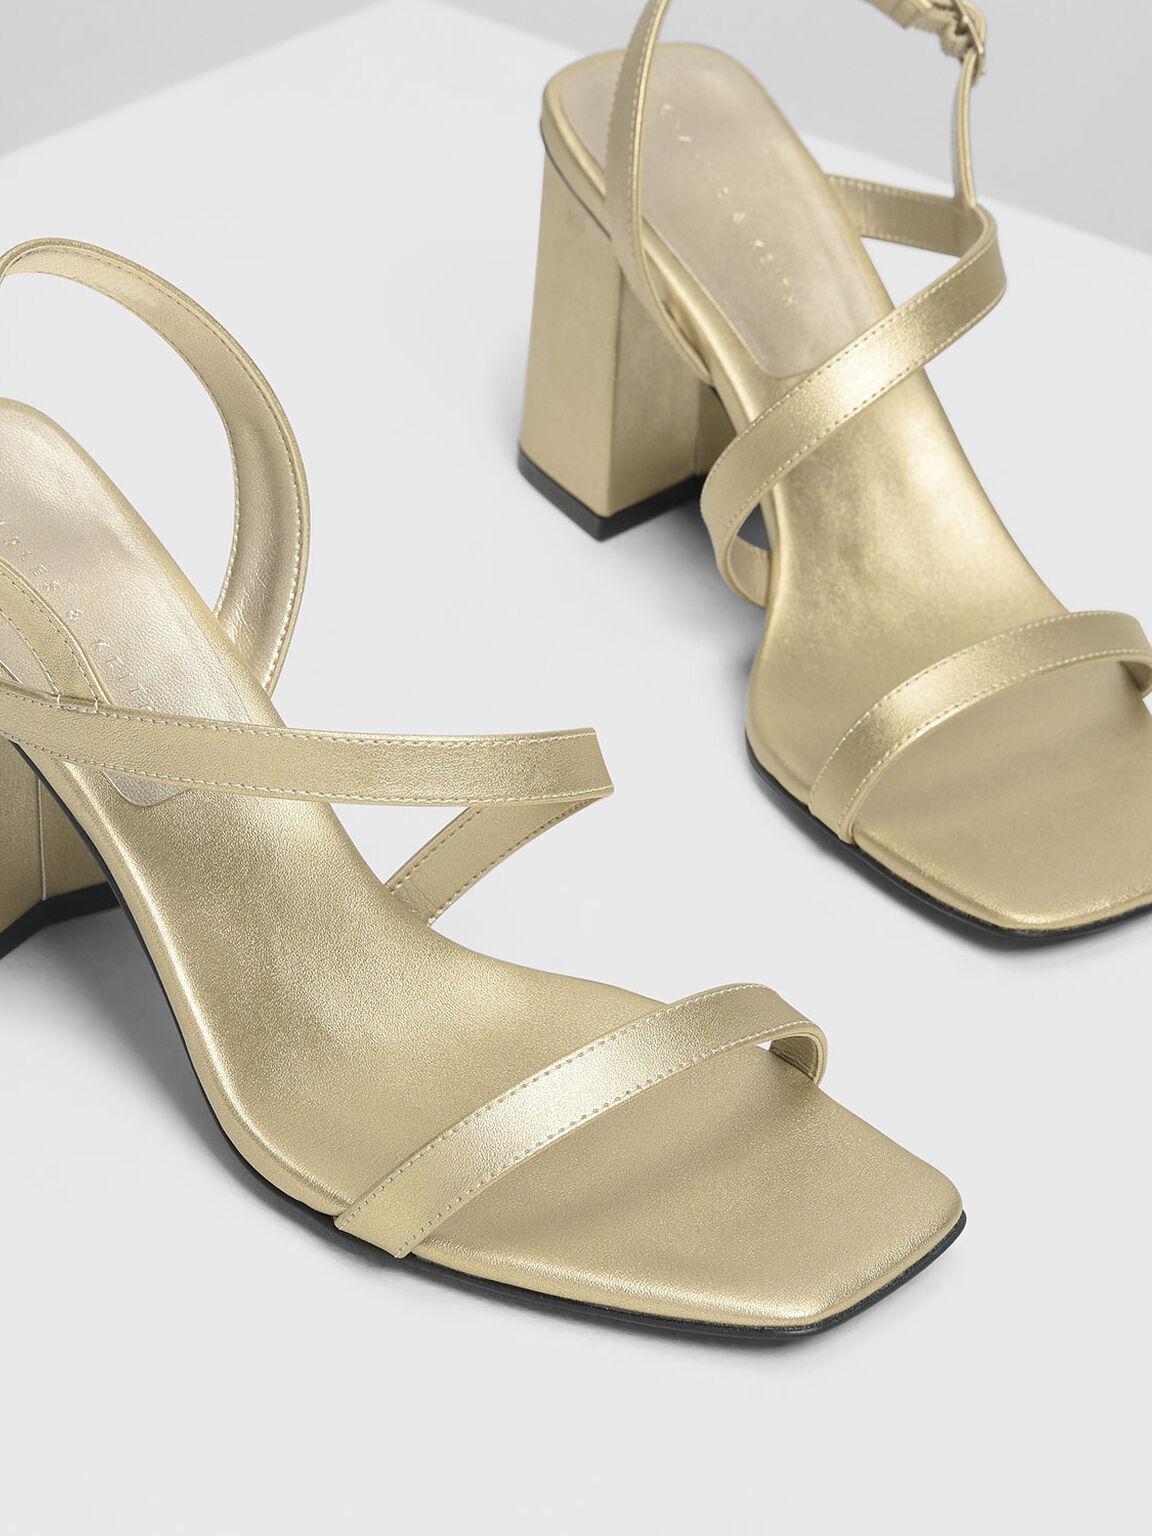 Asymmetrical Strap Heeled Sandals, Gold, hi-res